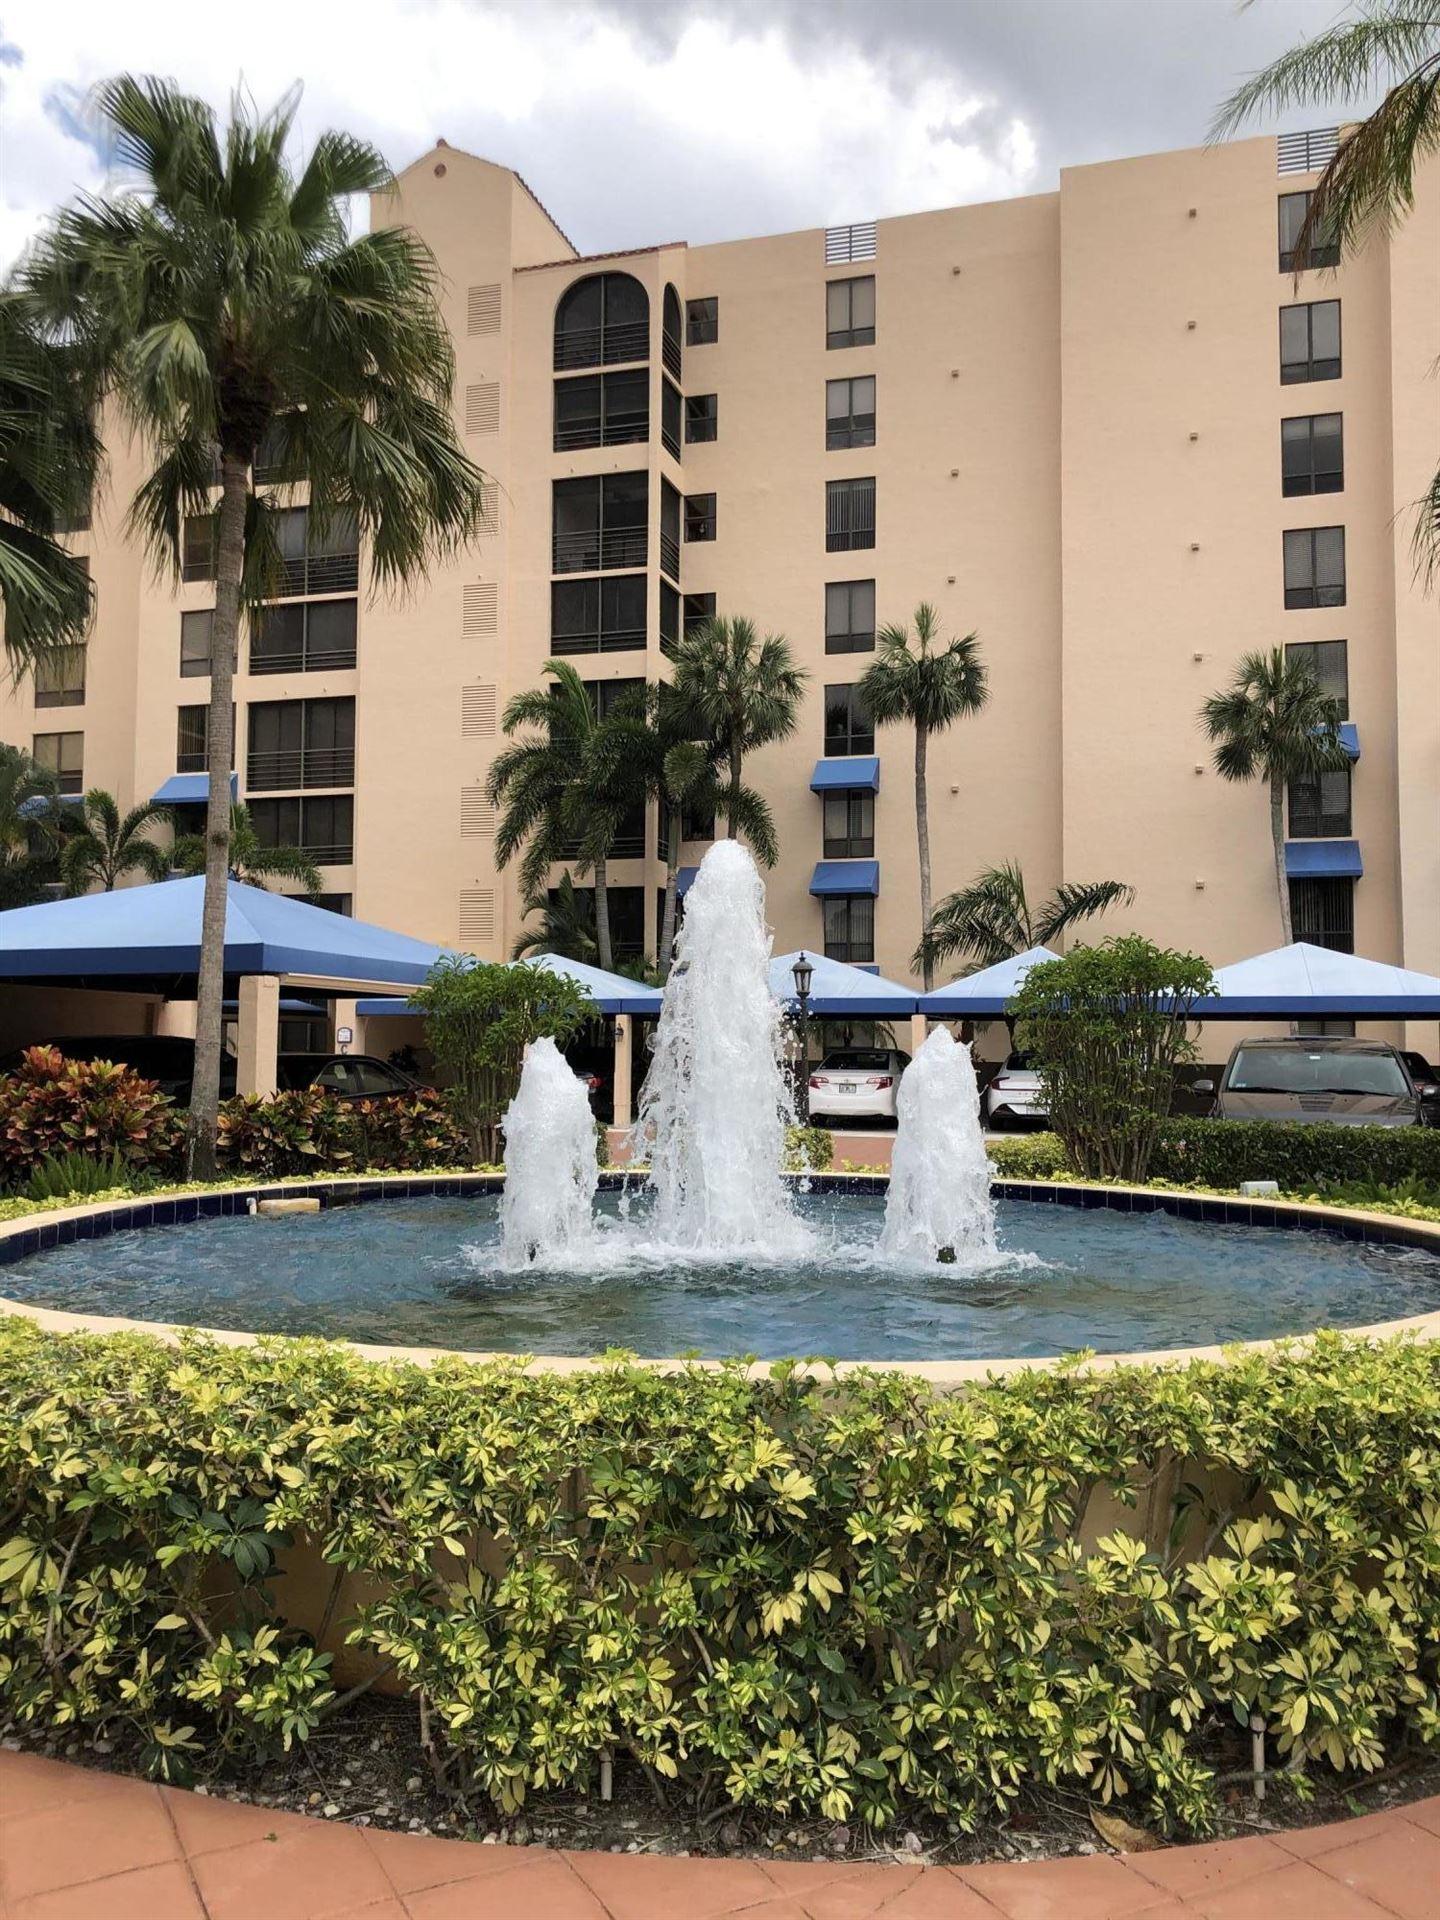 7186 Promenade Drive #C-501, Boca Raton, FL 33433 - MLS#: RX-10715297